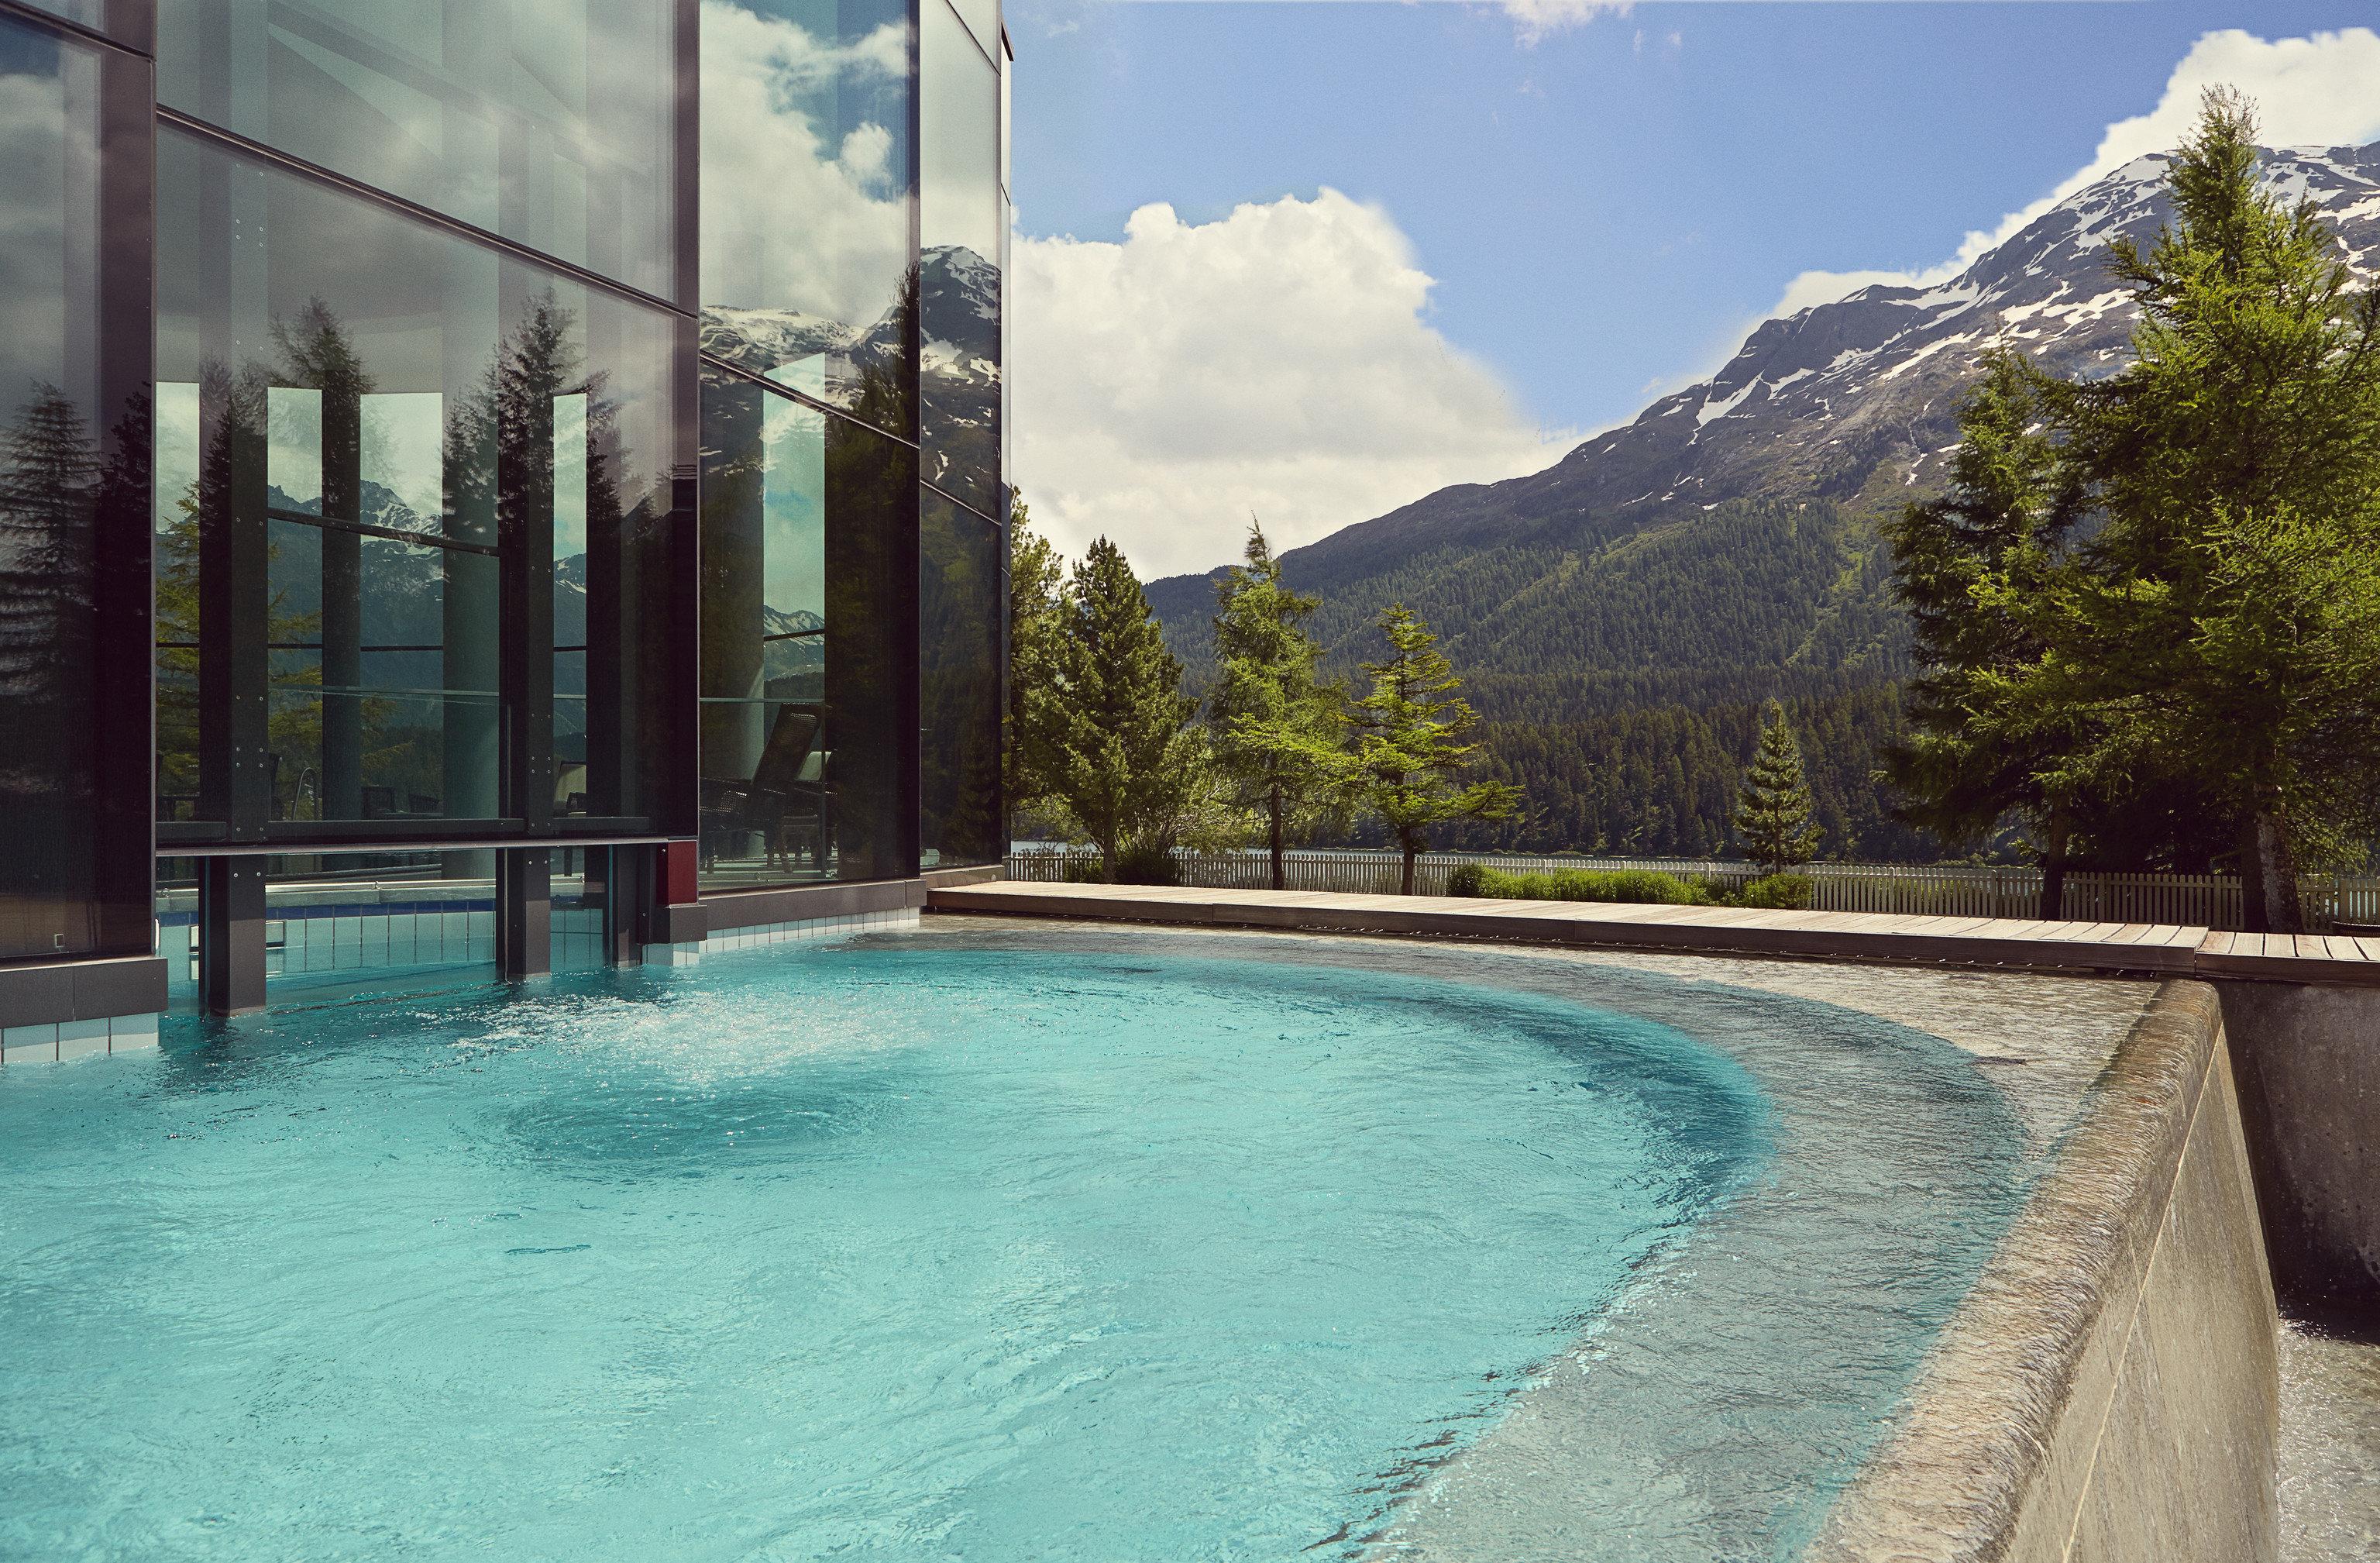 sky mountain swimming pool property Pool swimming Resort day